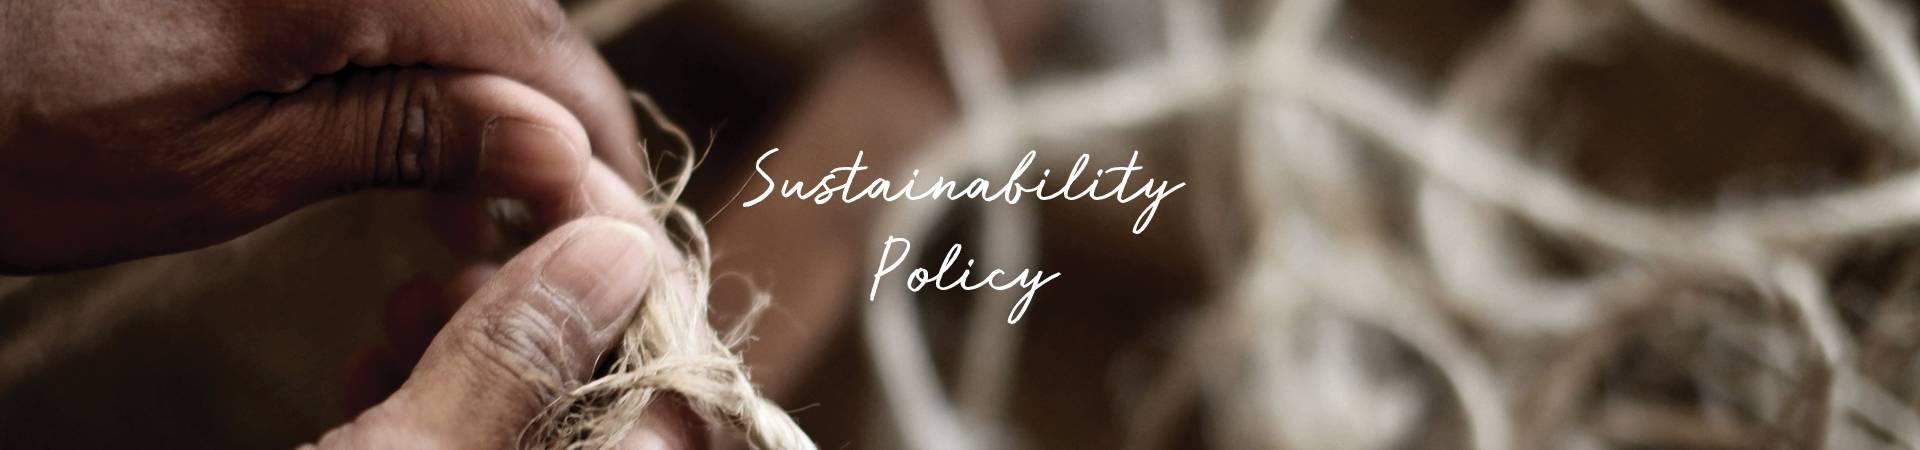 Sustainability Policy_desktop_1.jpg